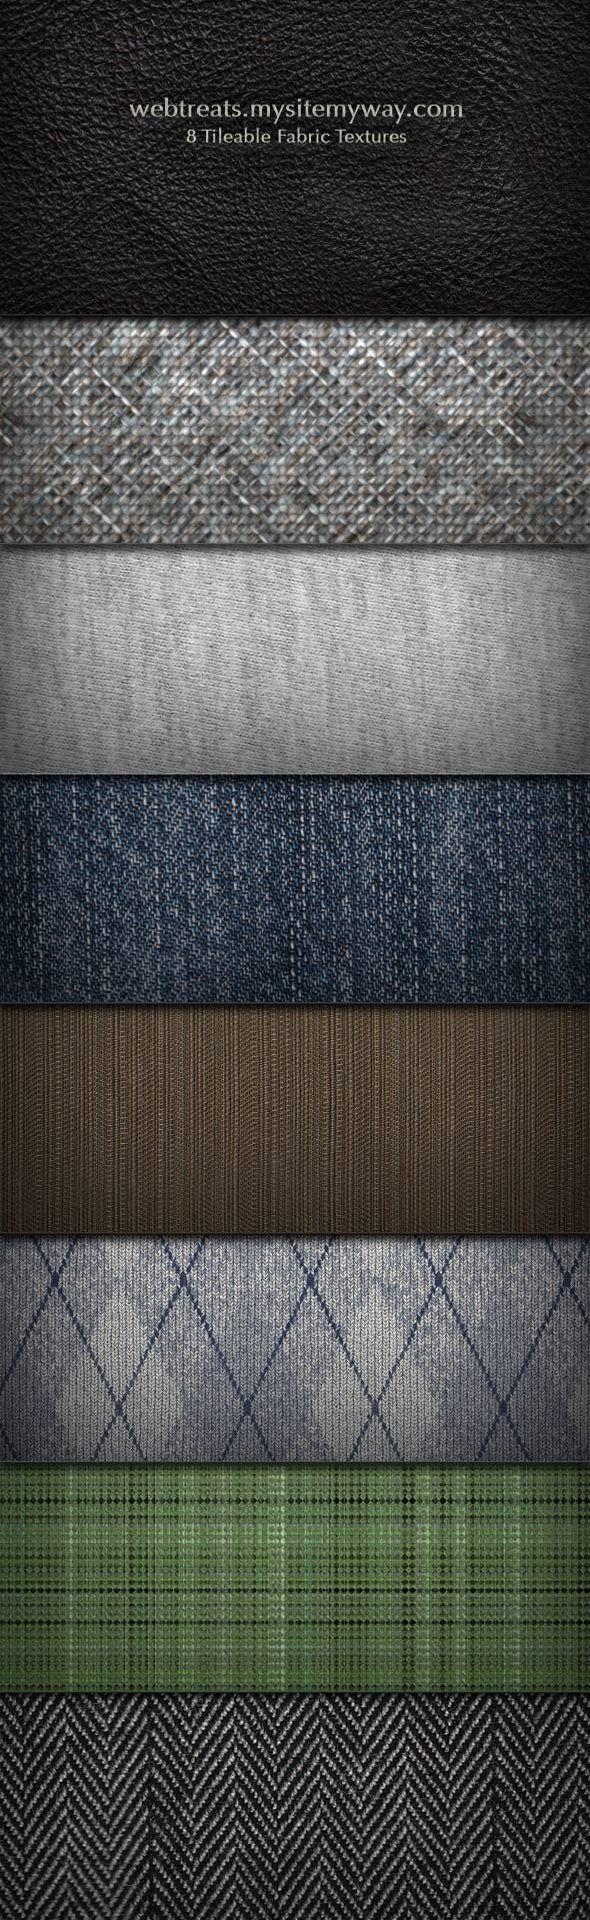 8 Free Tileable Fabric Textures join us http://pinterest.com/koztar/